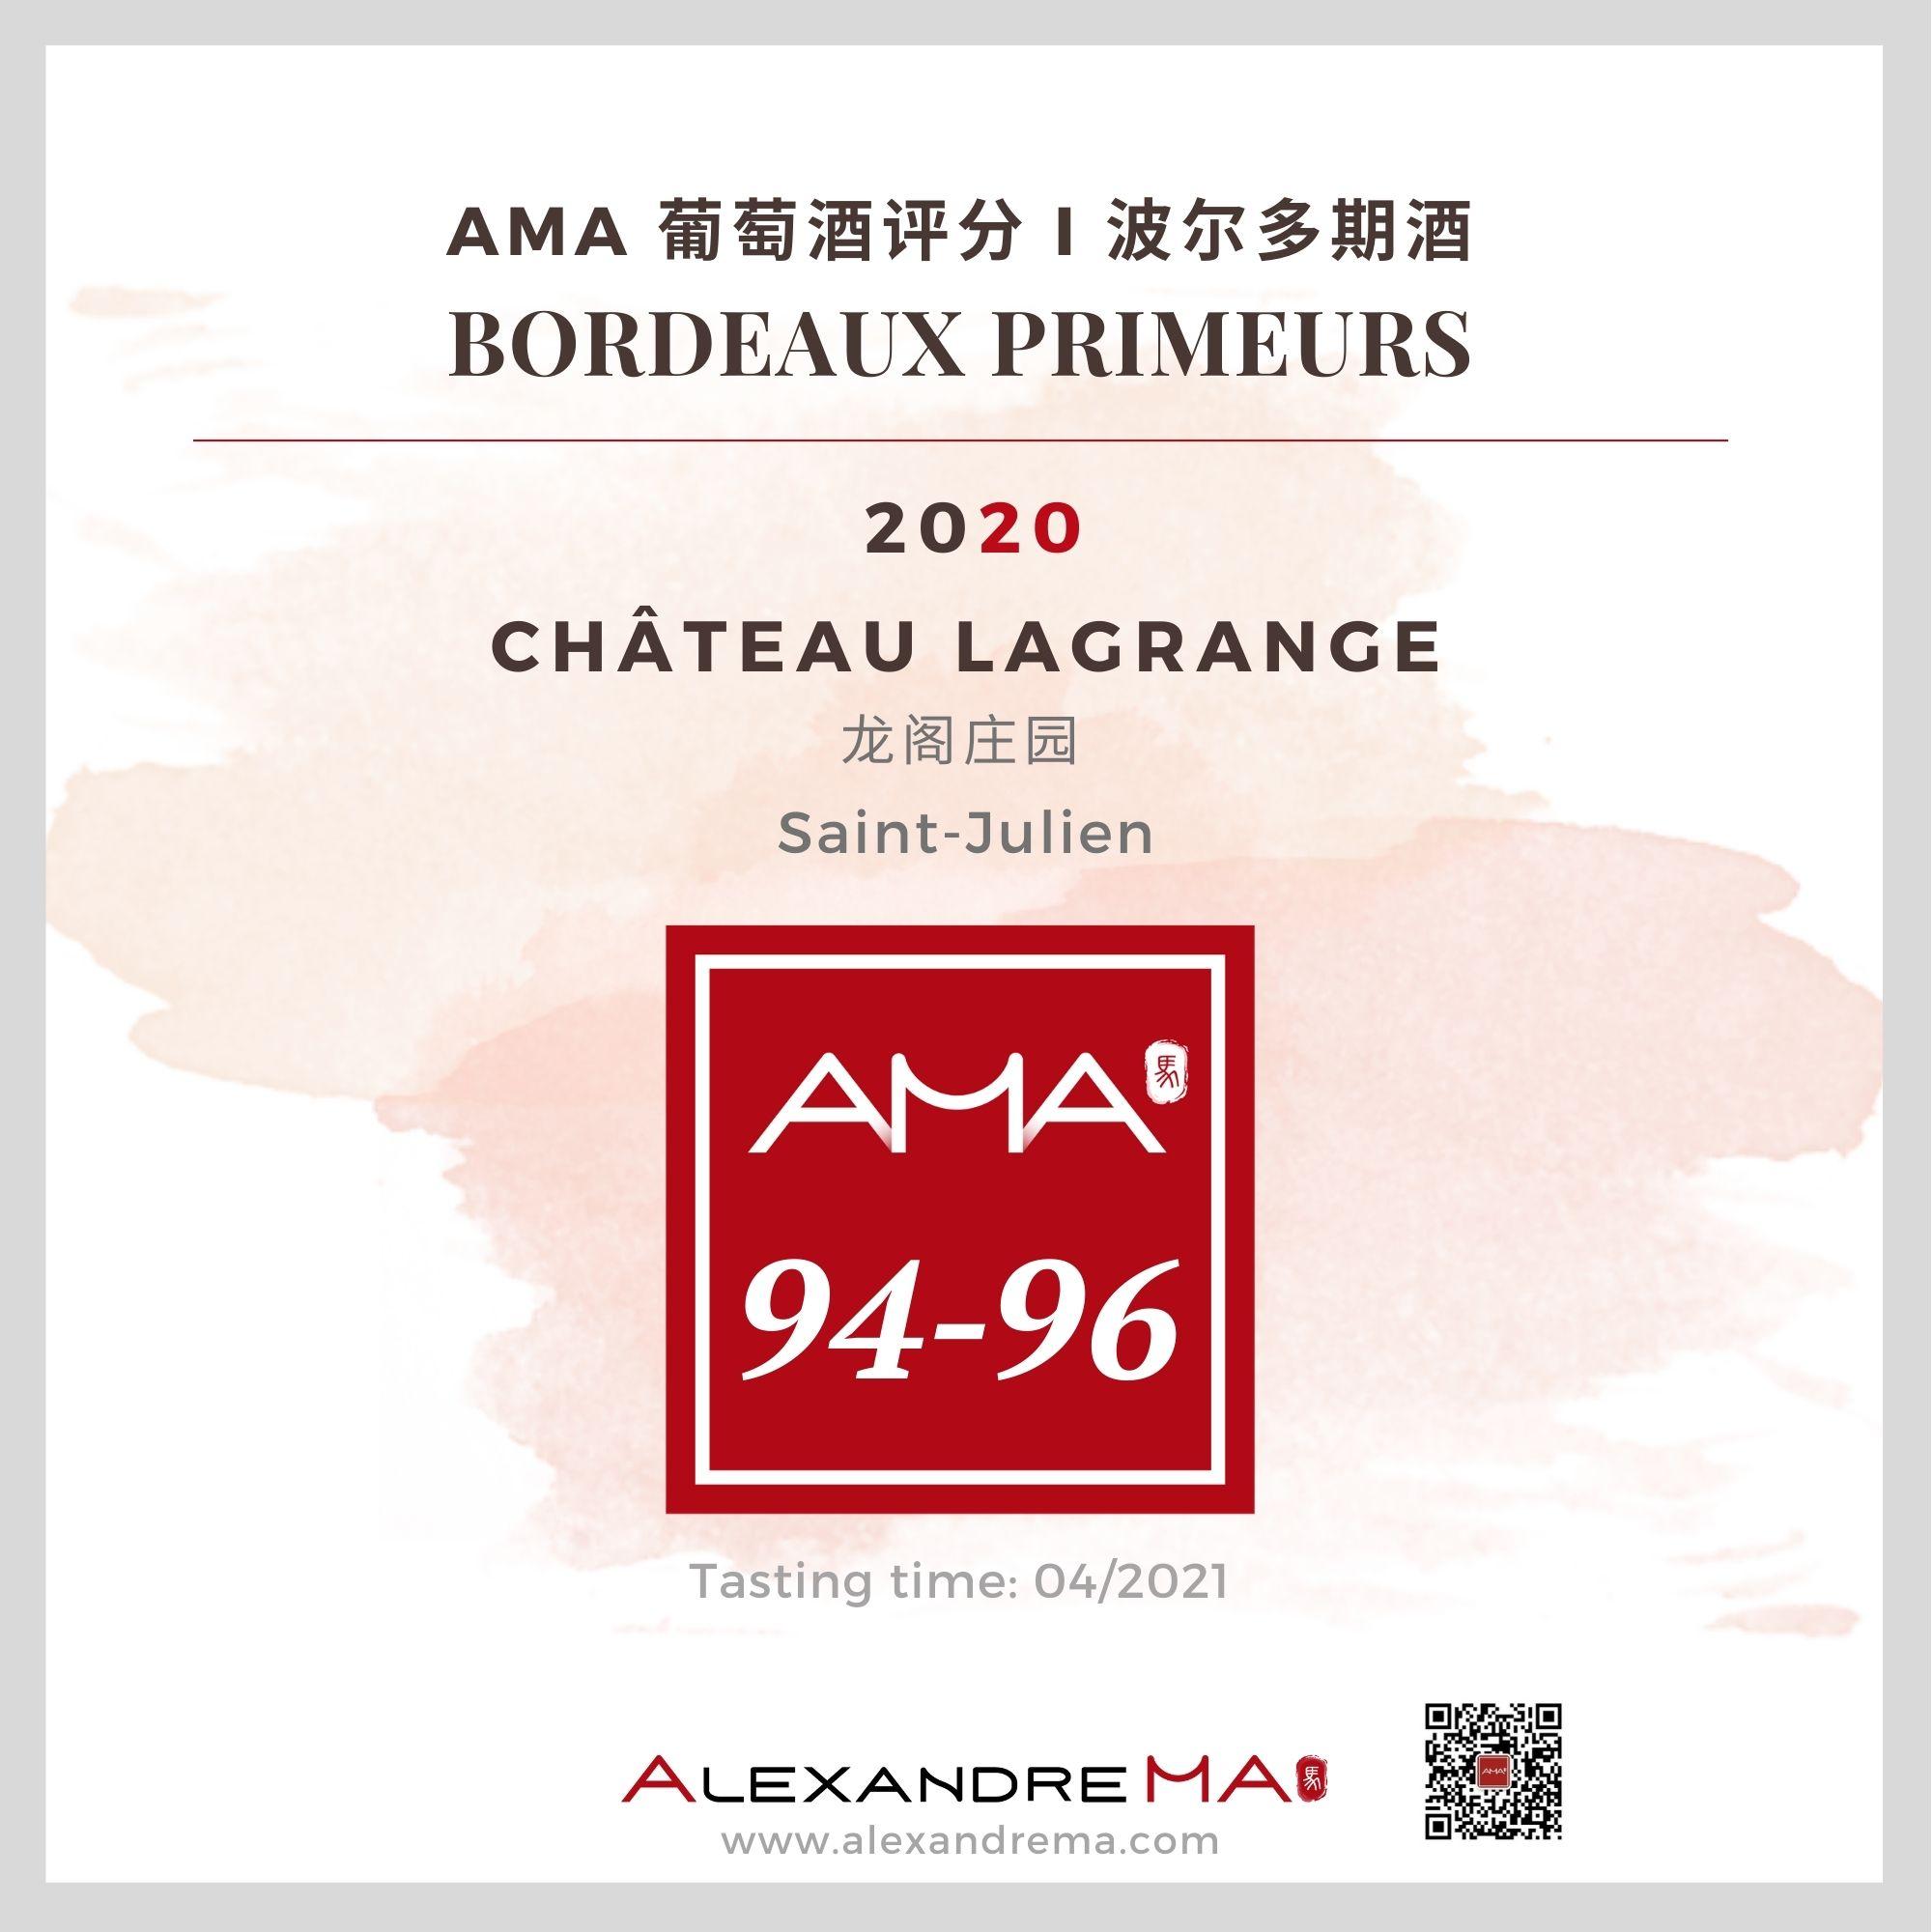 Château Lagrange 2020 龙阁庄园 - Alexandre Ma